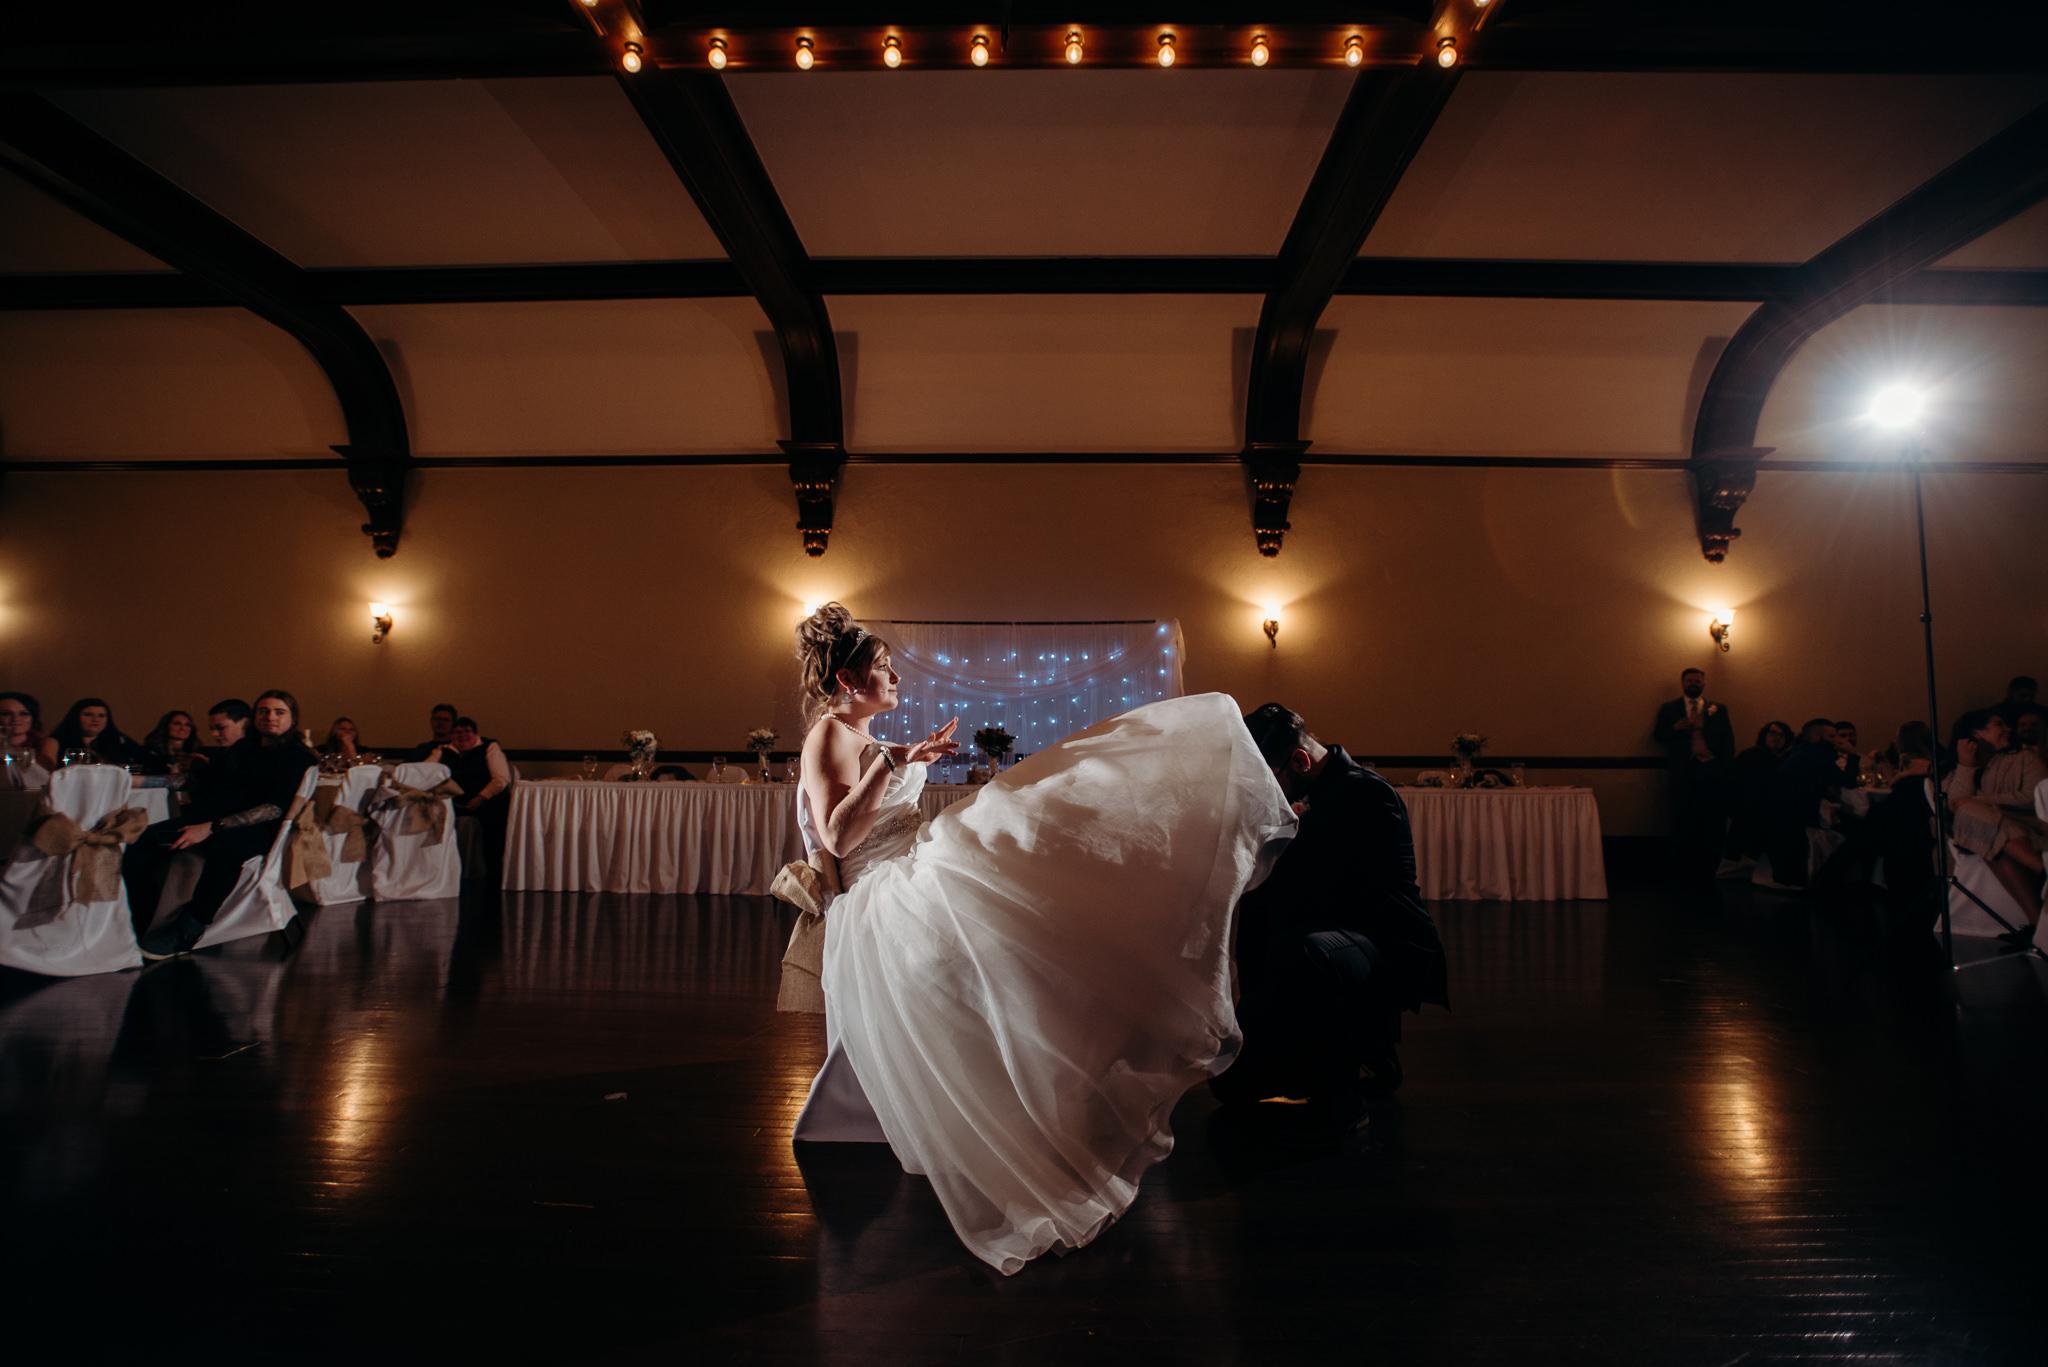 Grant Beachy Photo portrait wedding goshen elkhart south bend chicago-047.jpg